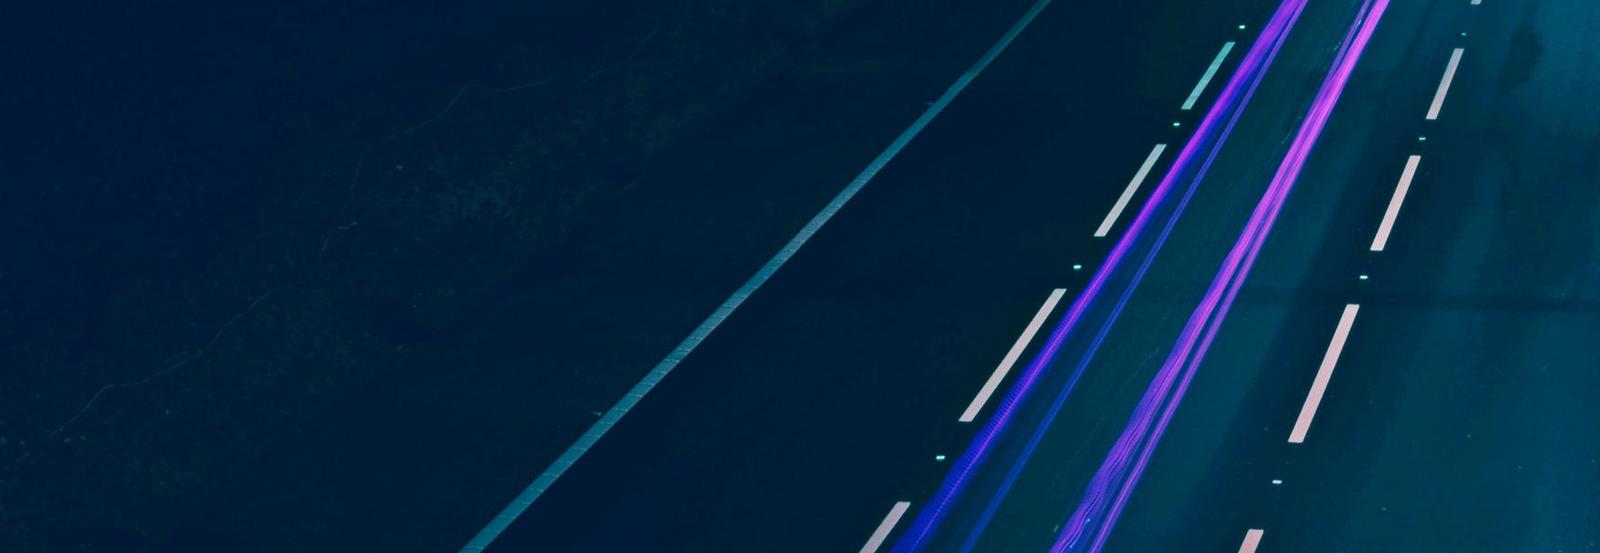 roadway at night